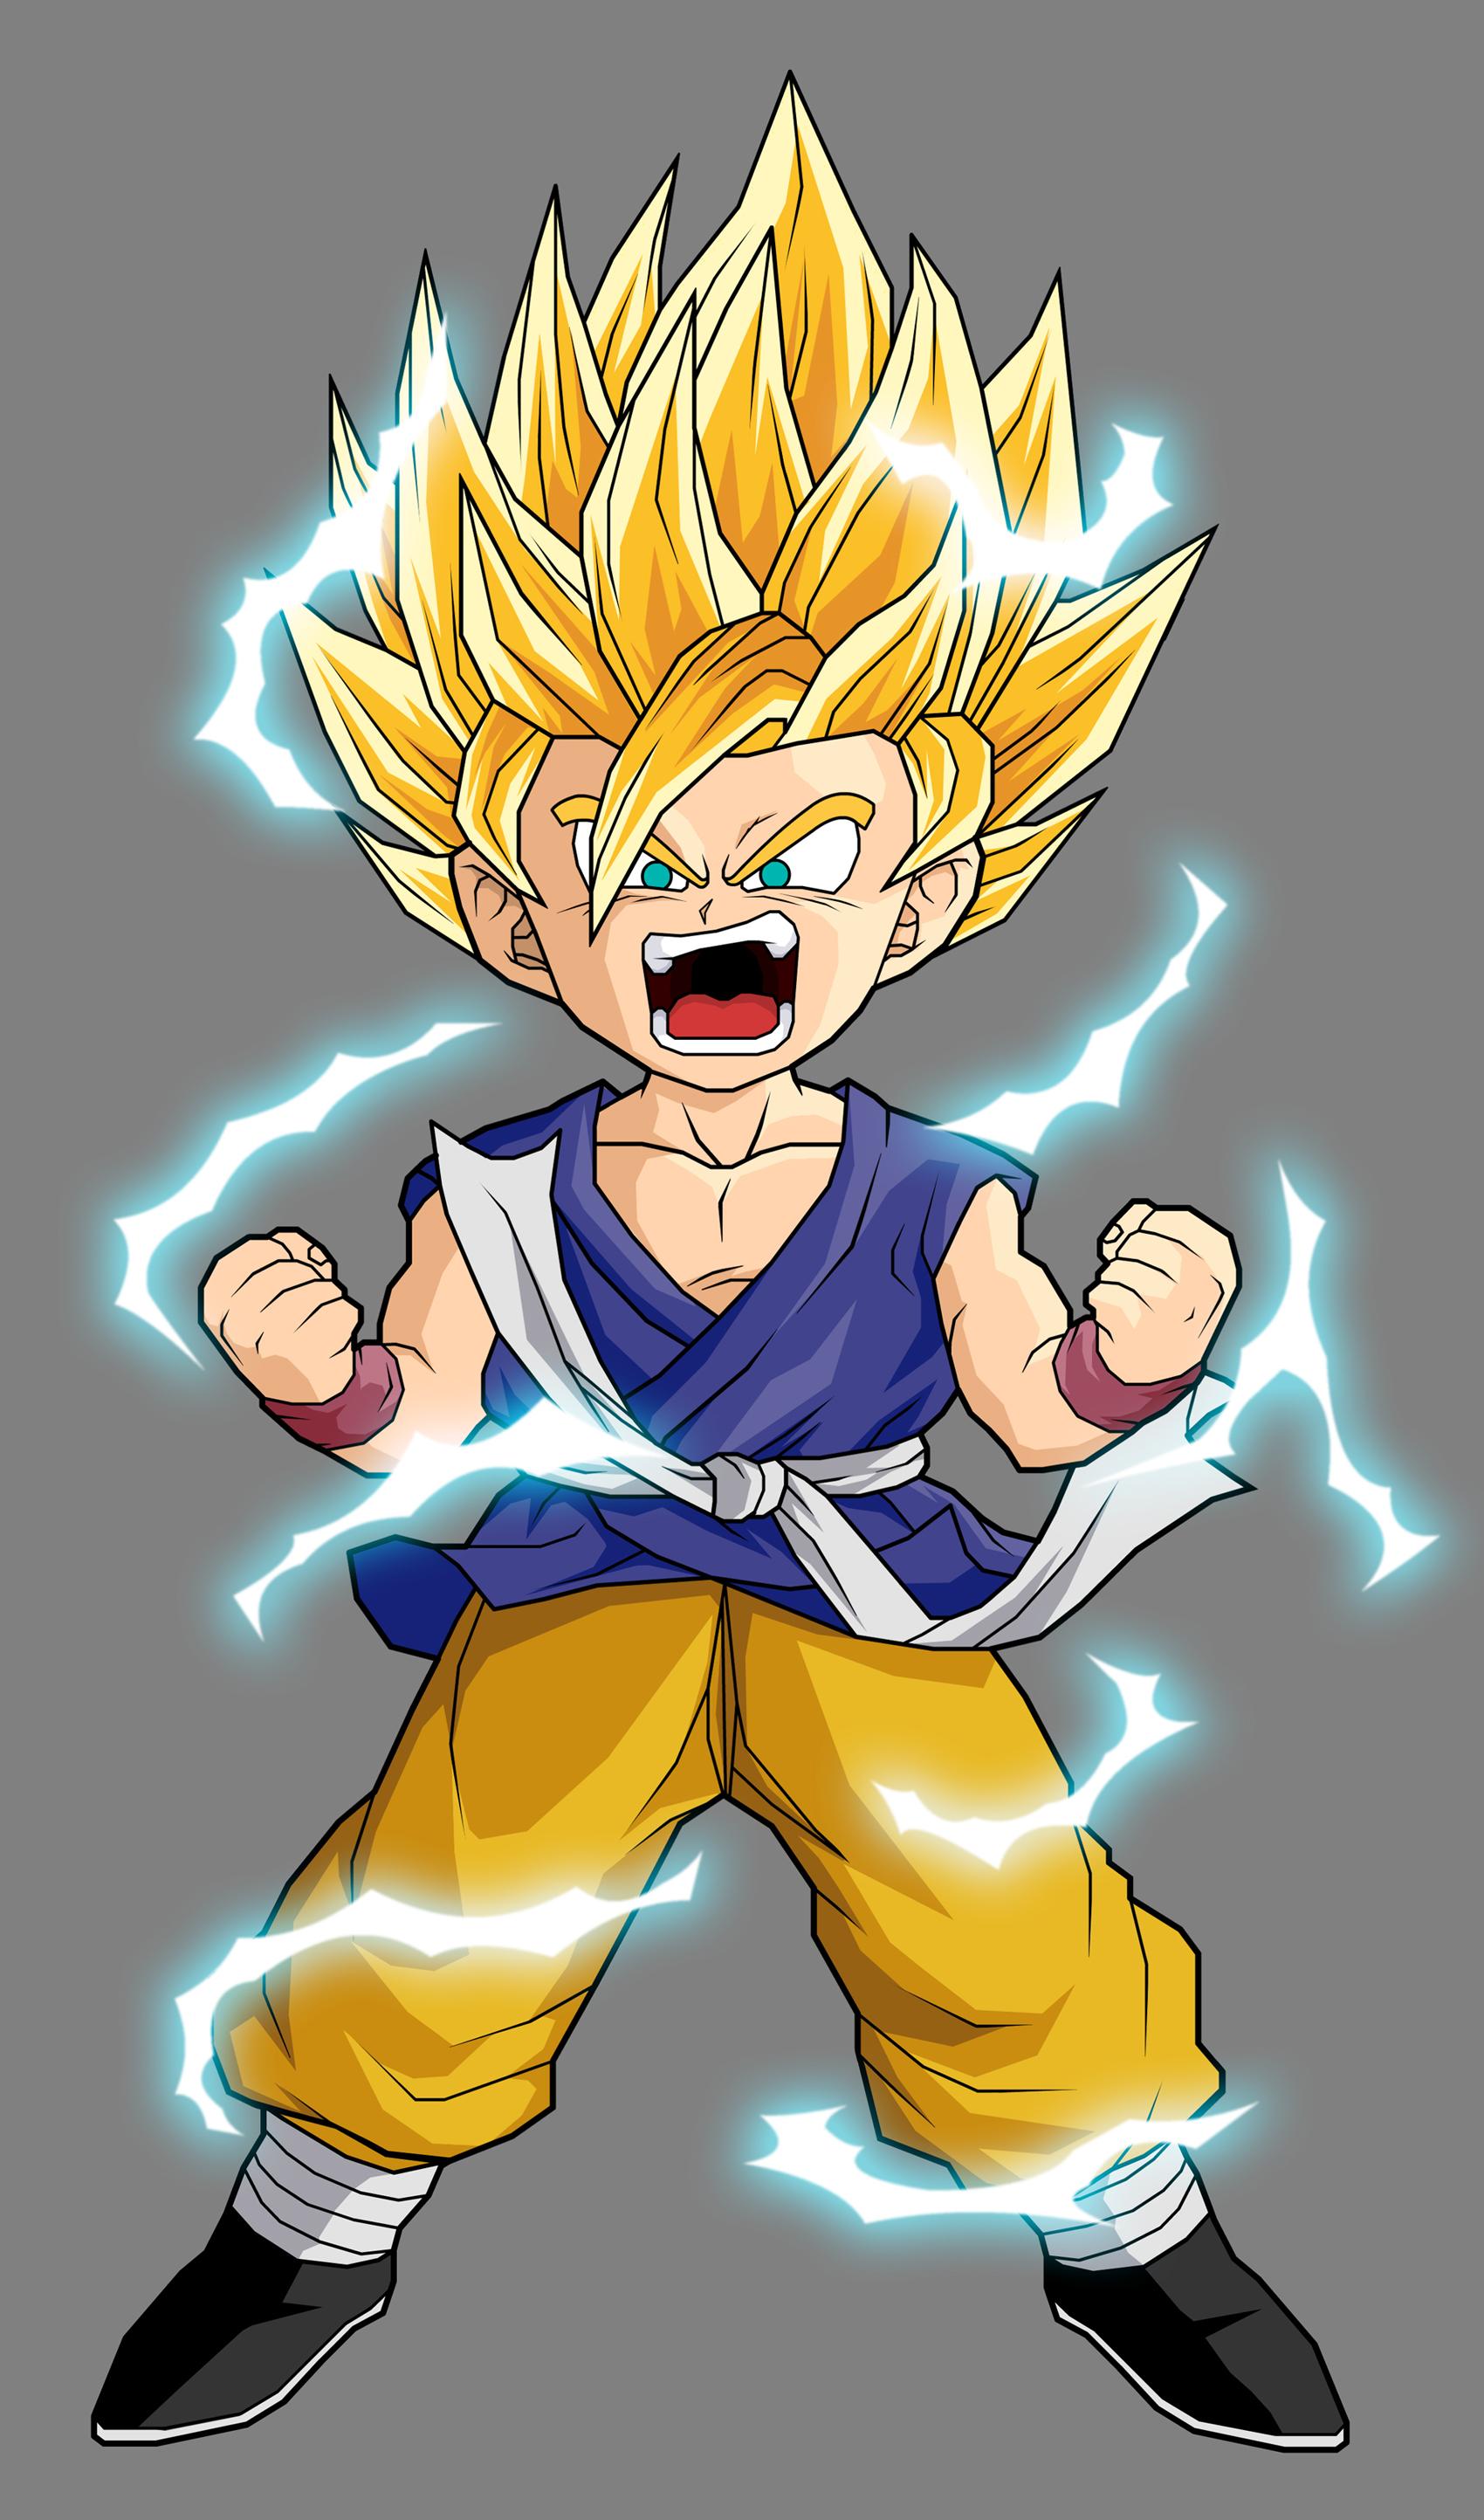 Glavni junaci crtanih filmova 20110412181524!GT_Kid_Goku_Super_Saiyan_2_by_dbzataricommunity